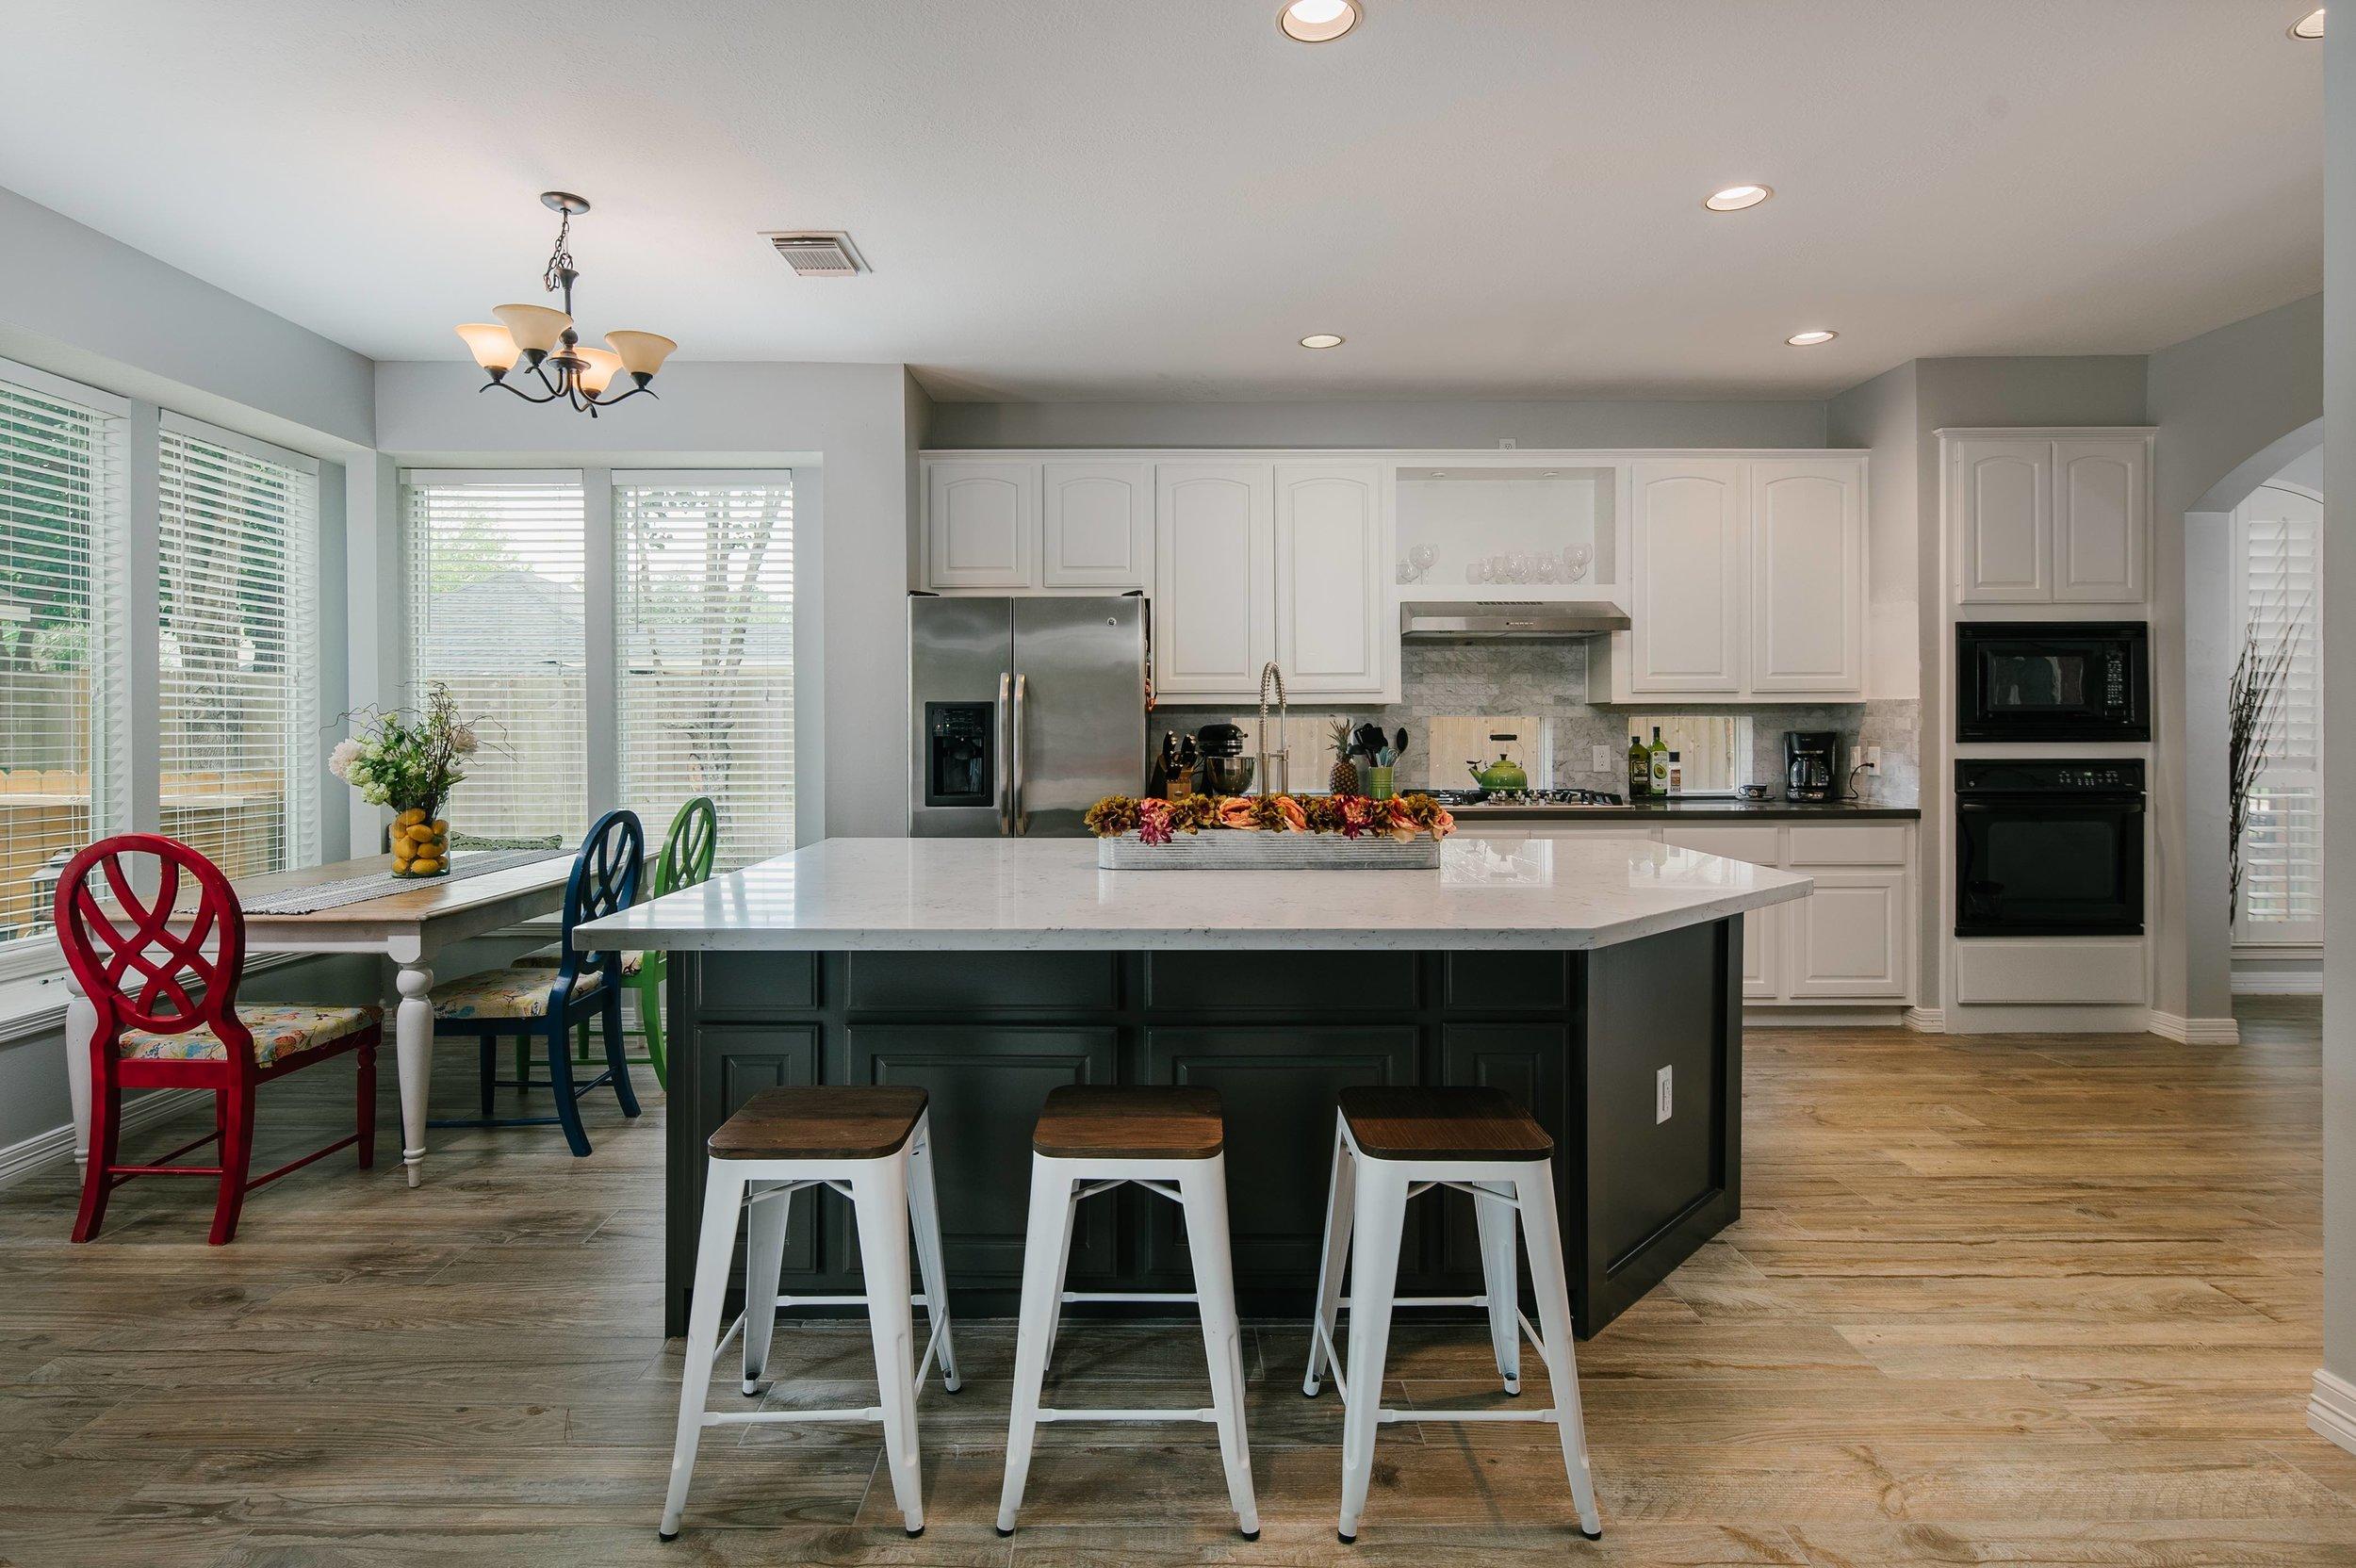 uKitchen Remodel. Quartz countertops, shaker style cabinets, white cabinets, black cabinets, woodblock tile floor, black quartz, white quartz.